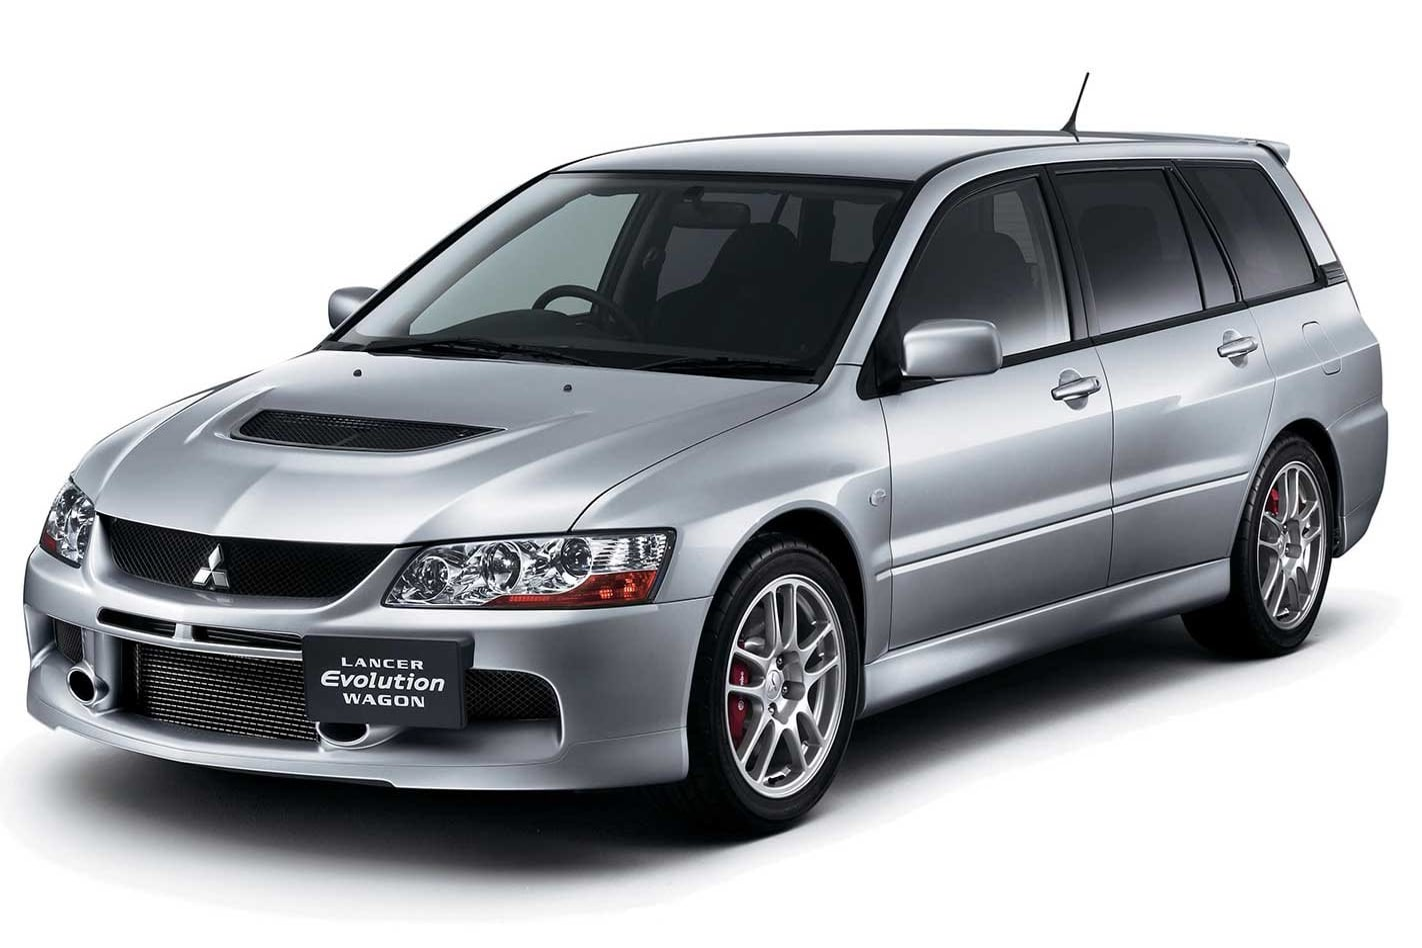 2005 Mitsubishi Lancer Evolution IX Wagon feature